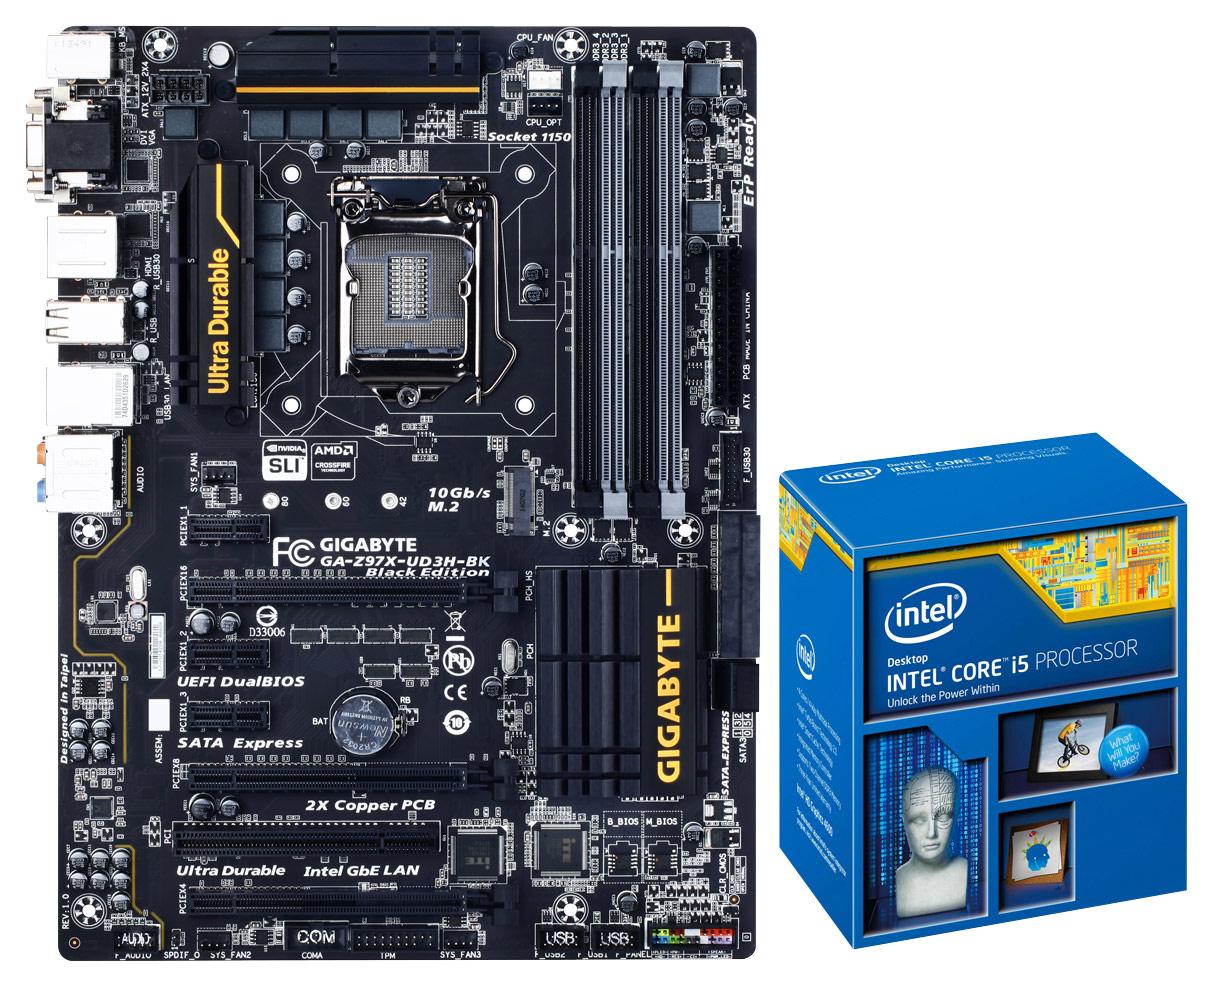 GIGABYTE - ATX Motherboard 1600/2933/3000MHz (Socket LGA 1150) and Intel® Core™ i5-4690K Processor - Multi